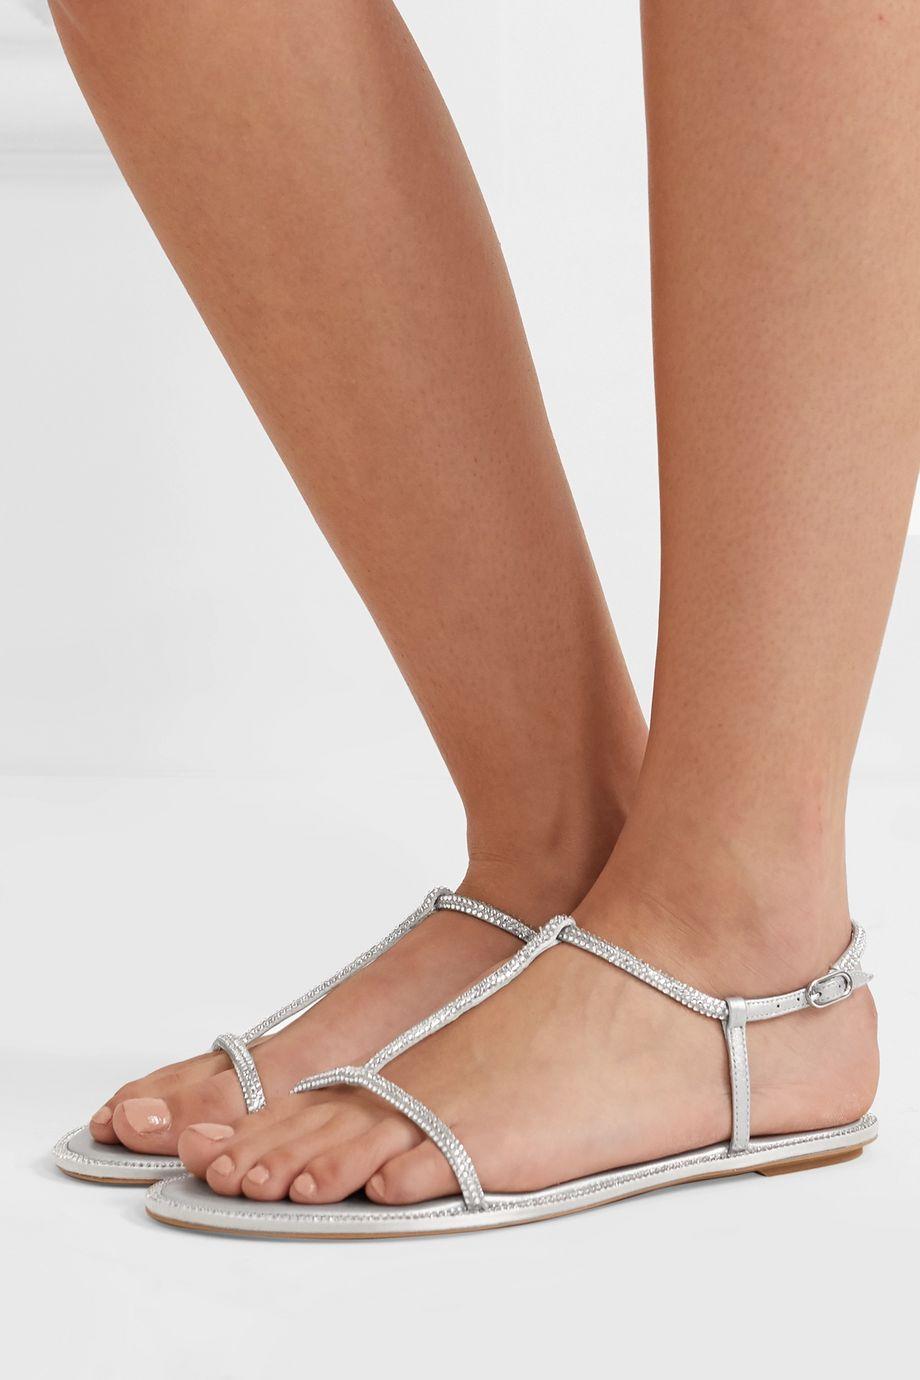 René Caovilla Crystal-embellished leather sandals